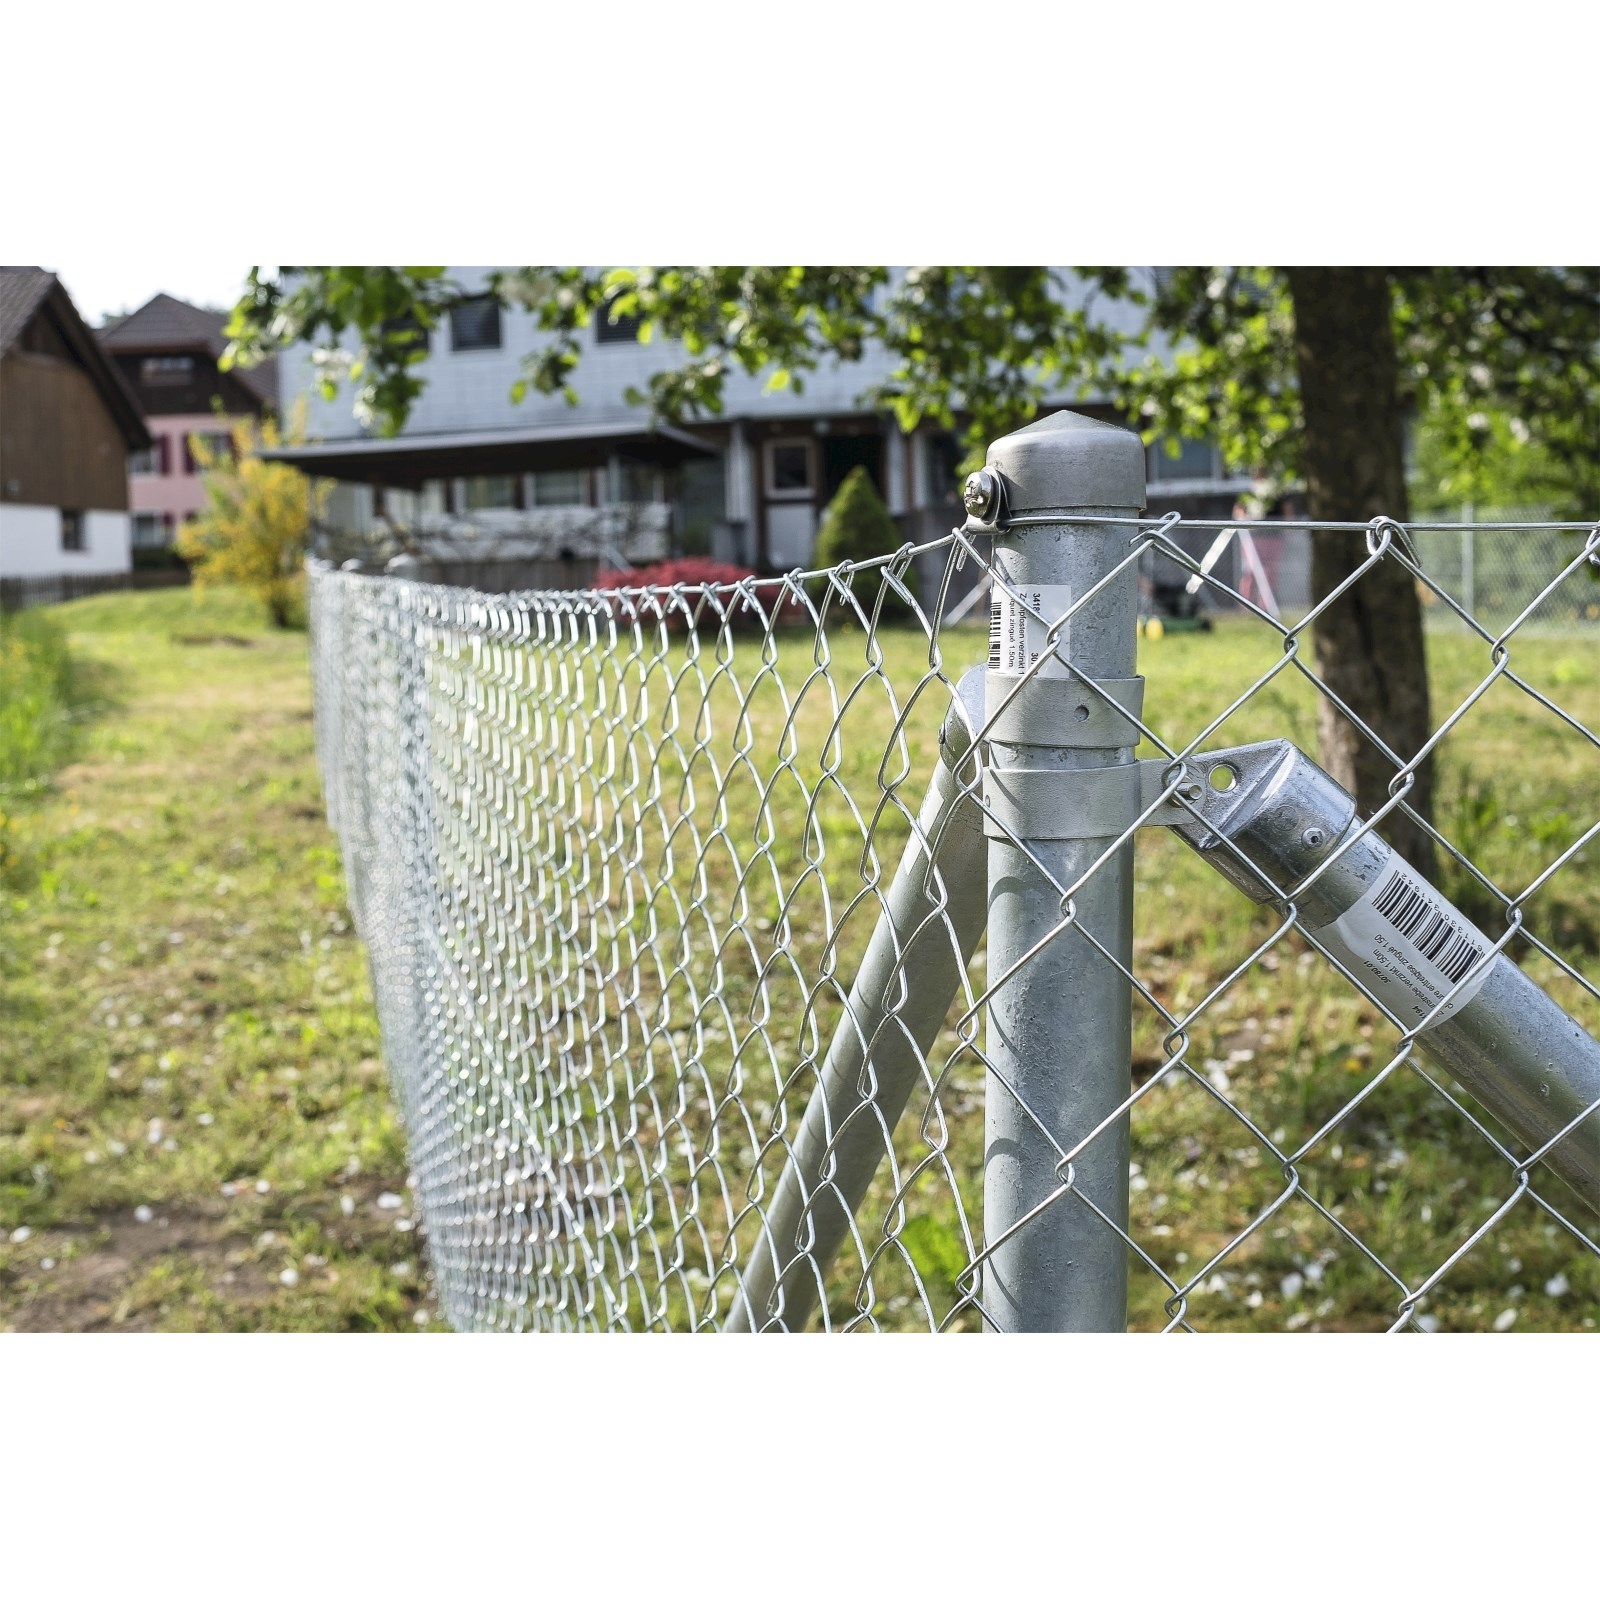 Beliebt Zaunpfosten 1,5 m, verzinkt - Pfähle / Pfosten - LANDI HE45